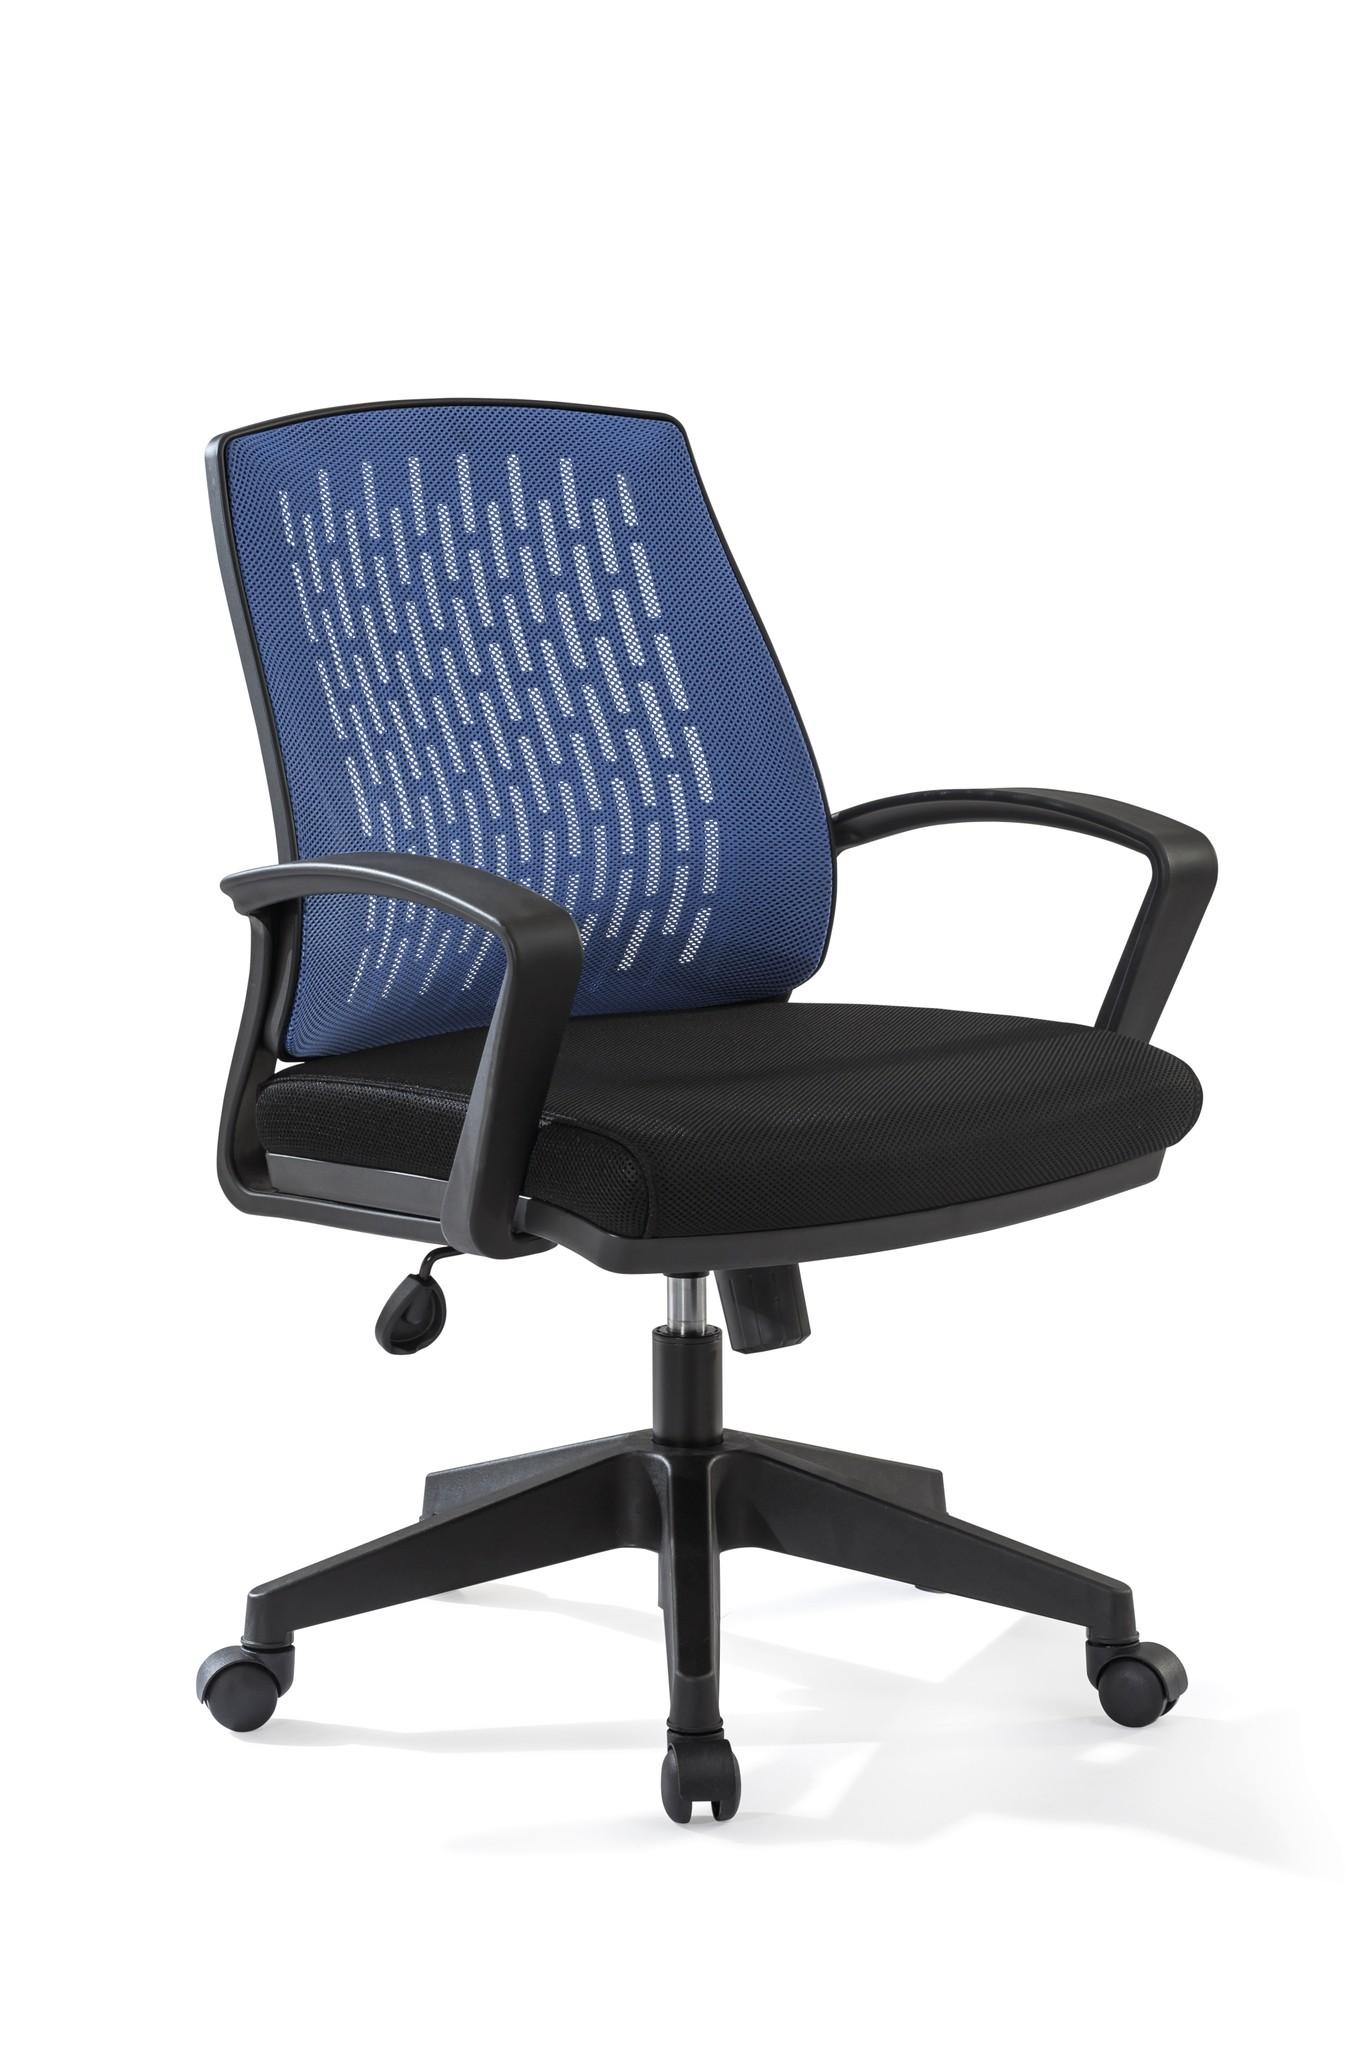 scaun birou copii tapitat somproduct